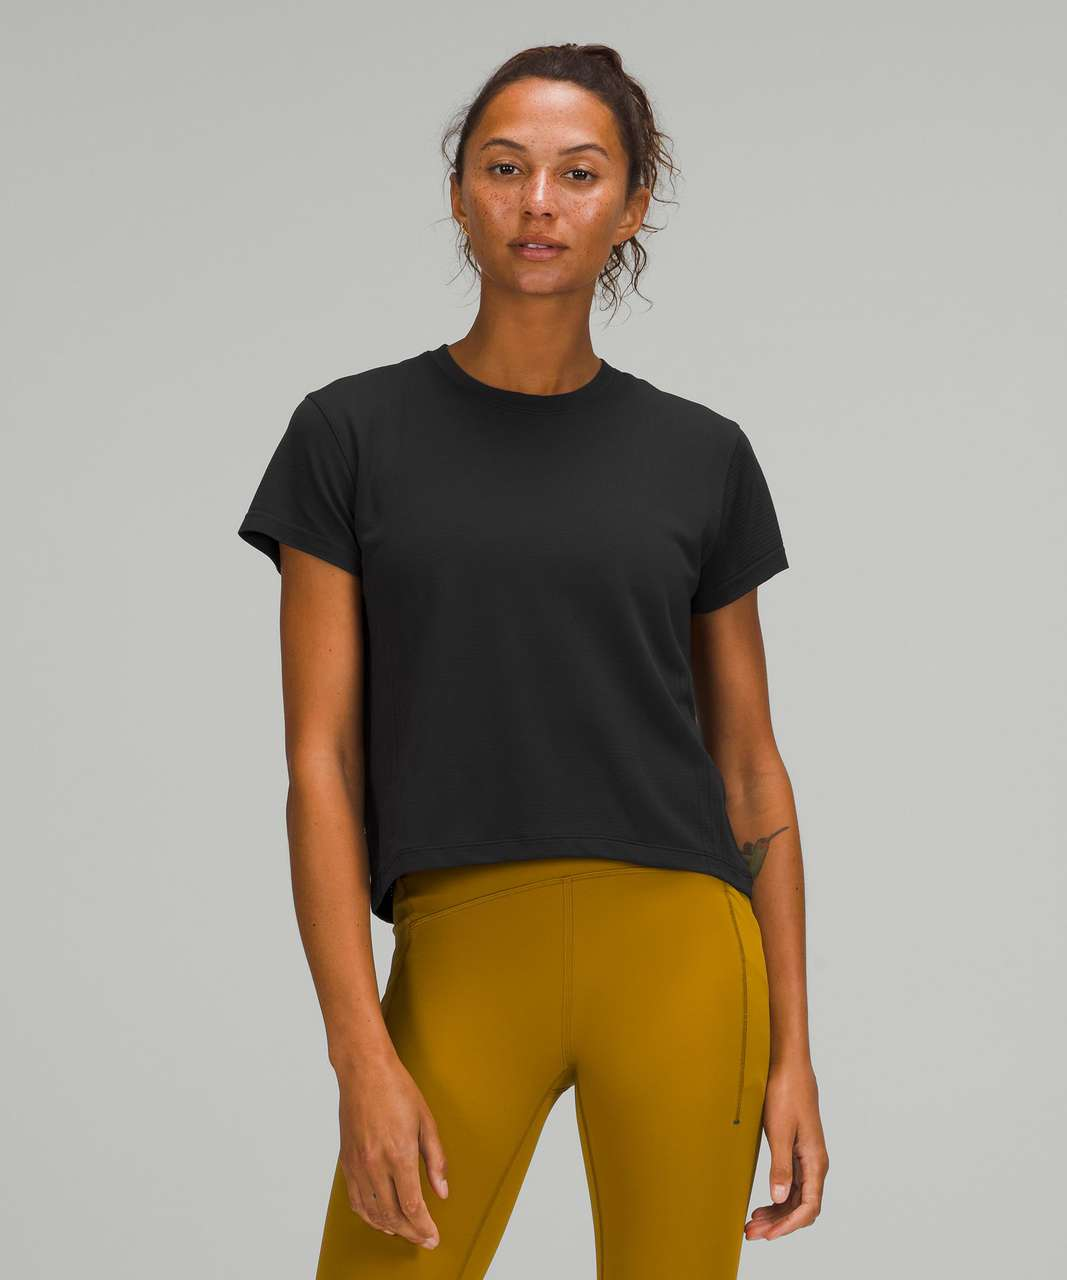 Lululemon Train to Be Short Sleeve Shirt - Black / Black